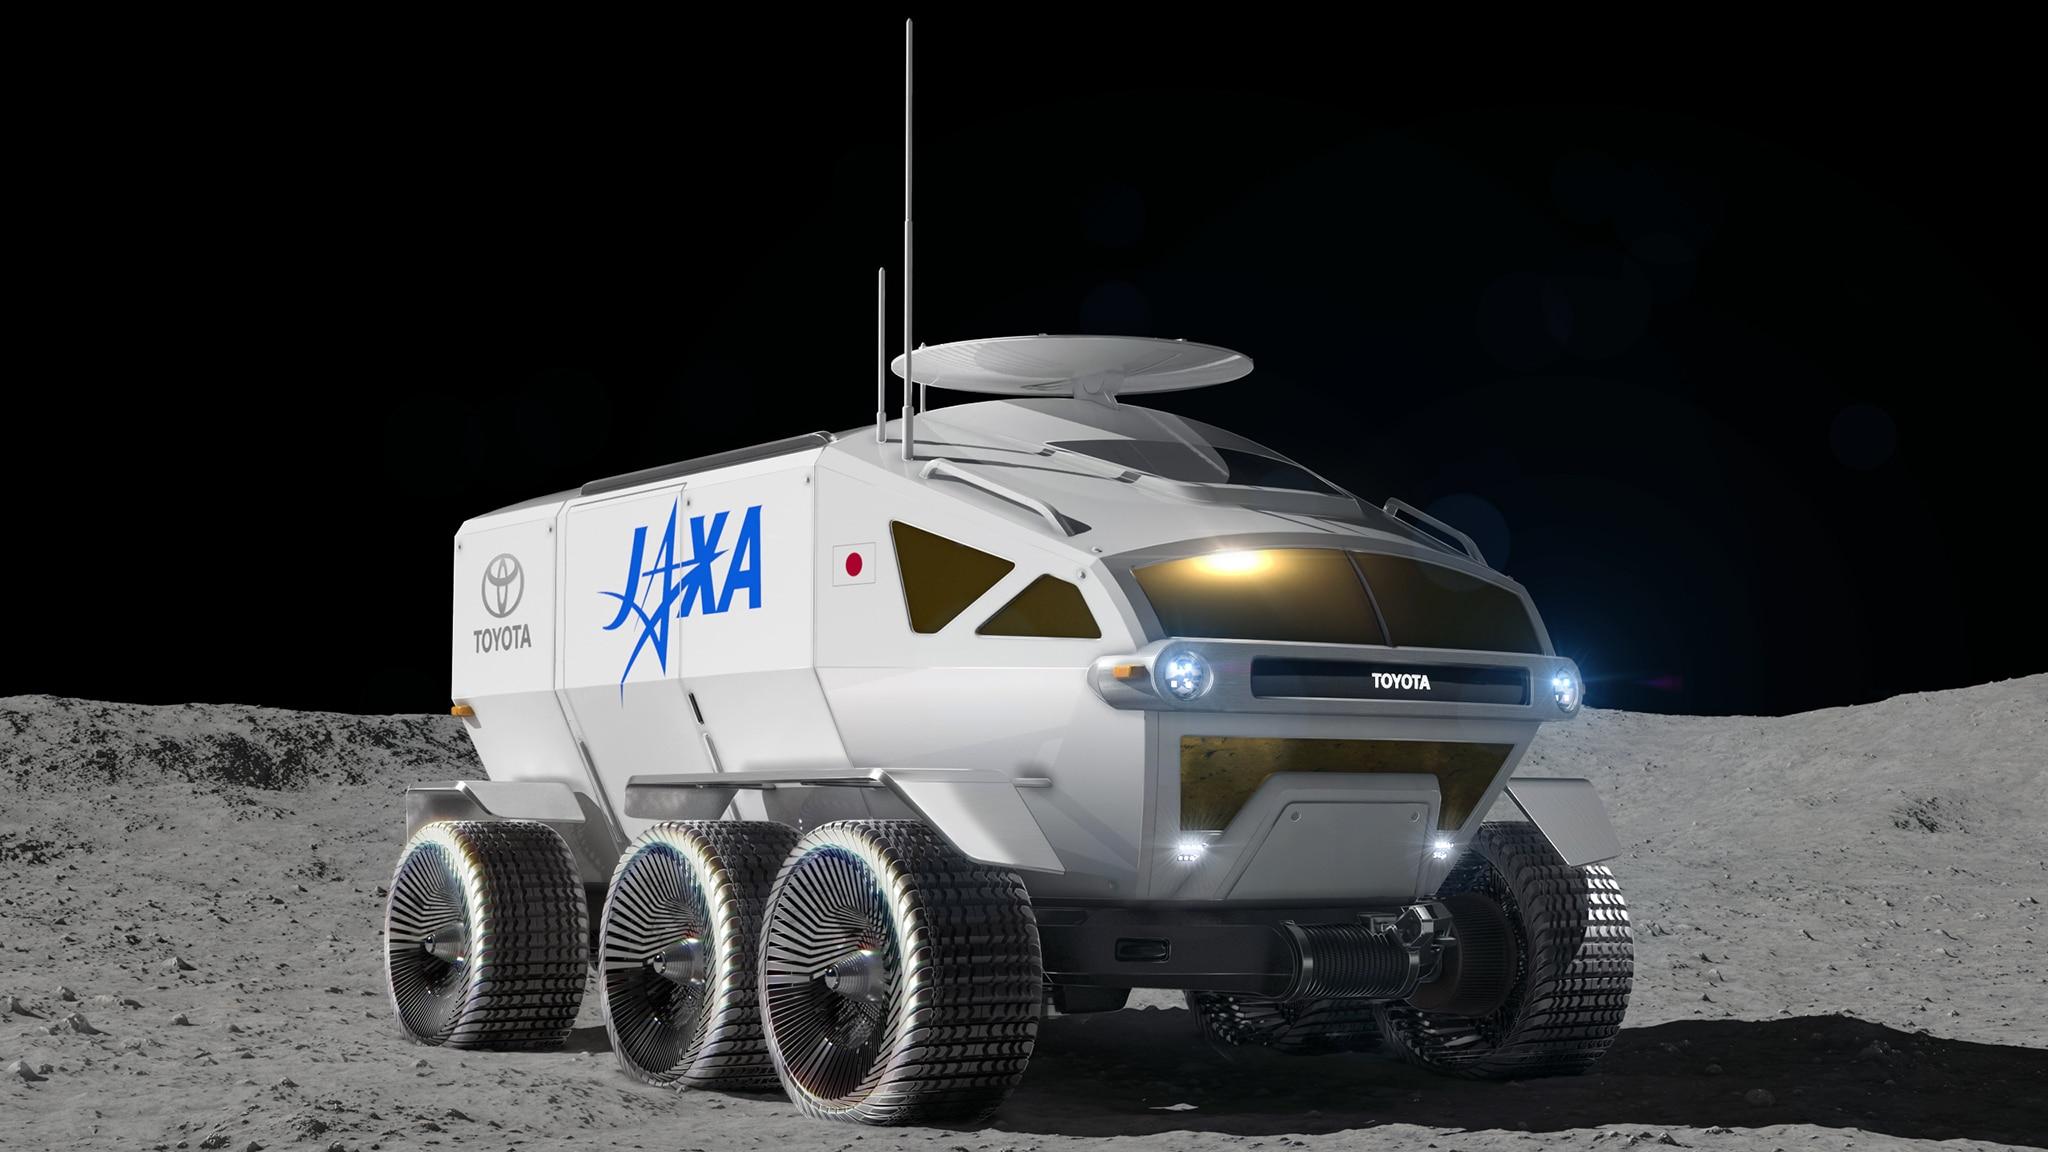 2019 Toyota JAXA Pressurized Rover_01